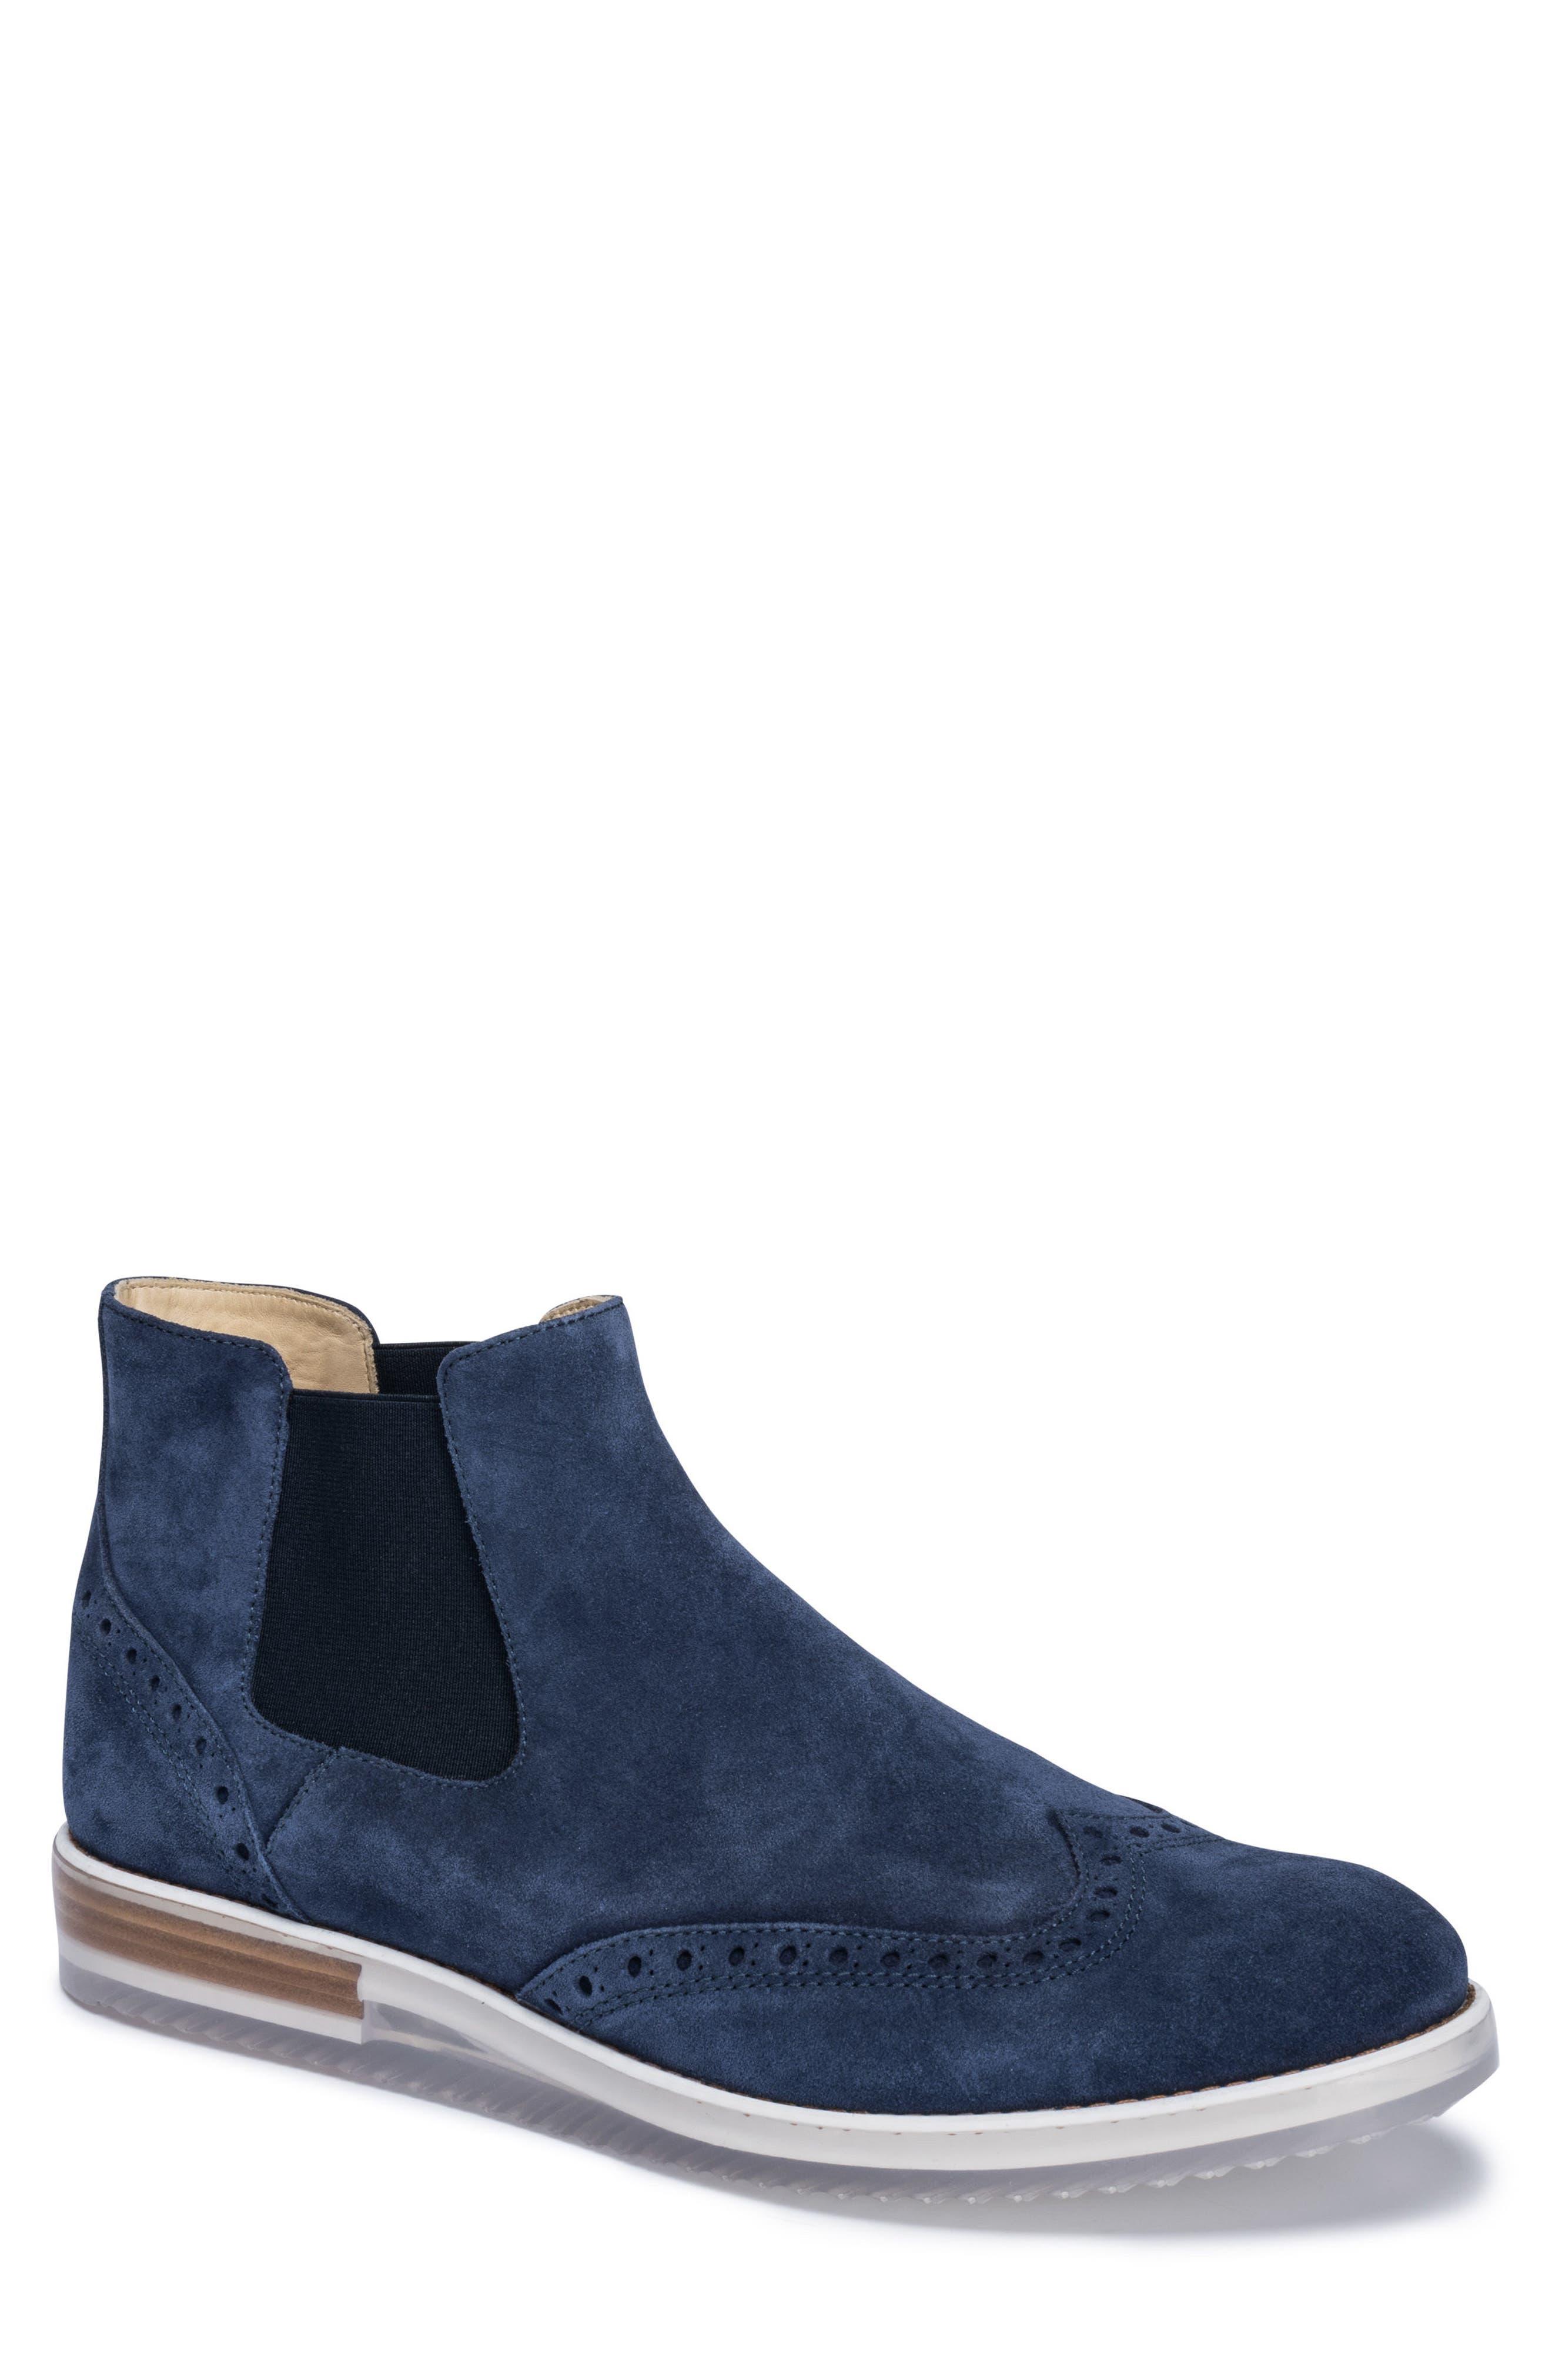 Brescia Mid Chelsea Wingtip Sneaker Boot,                         Main,                         color, Blue Suede